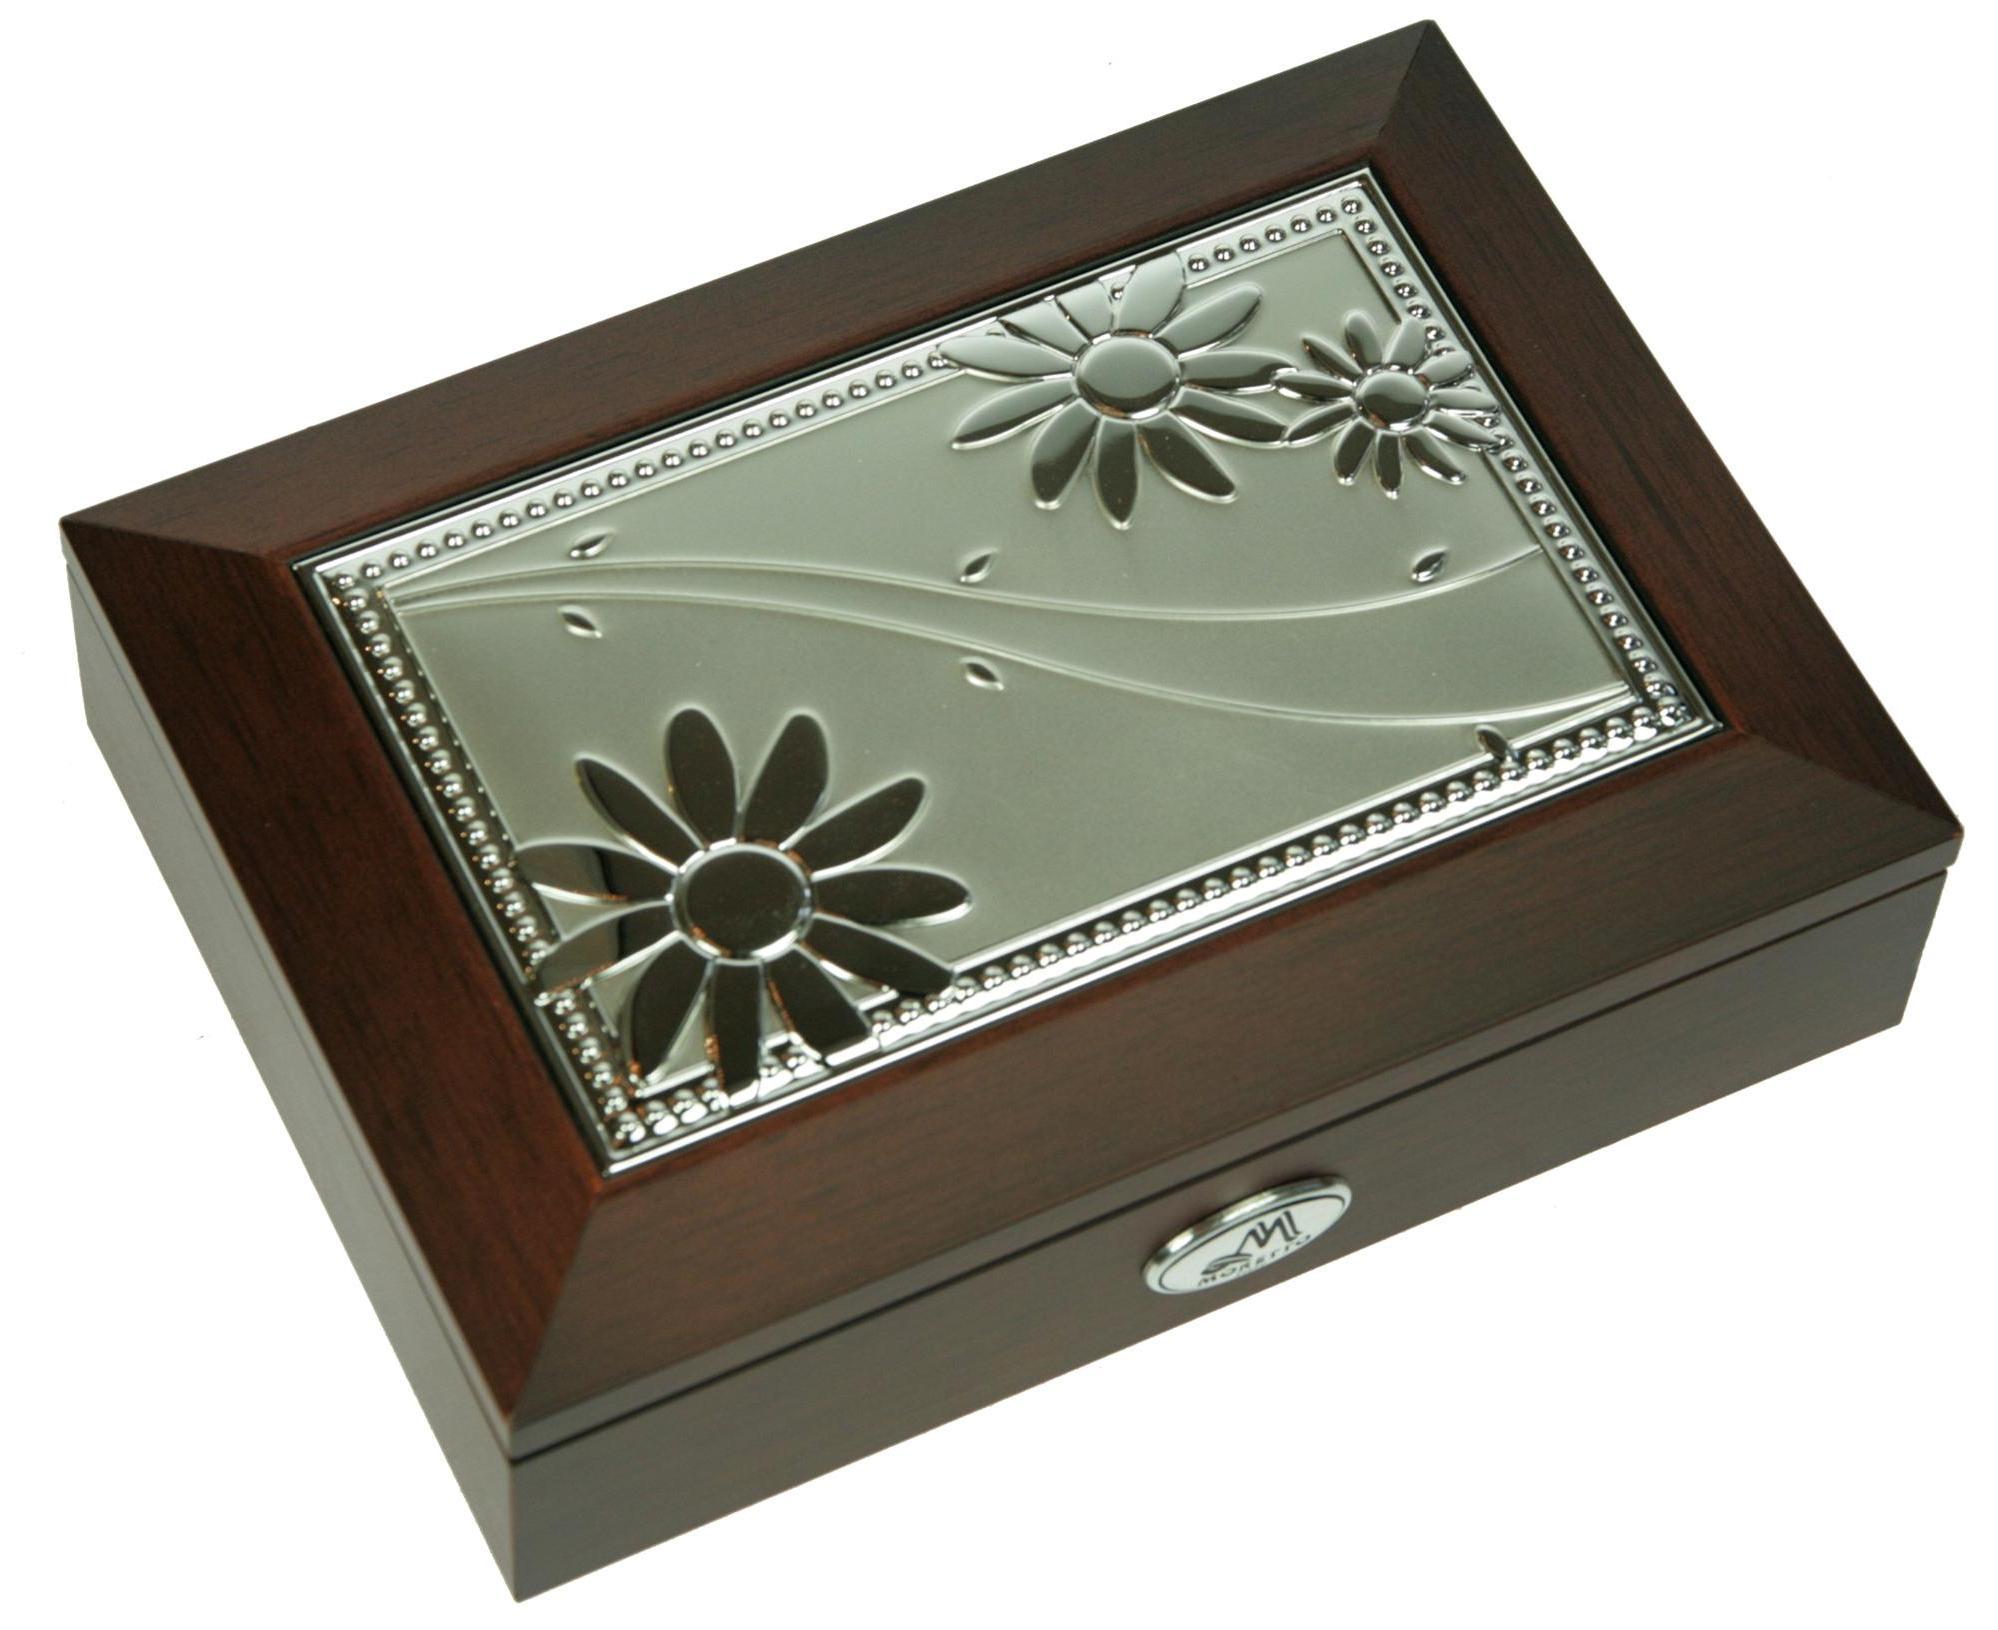 Шкатулка для ювелирных украшений Moretto, 18 х 13 х 5 см. 39849